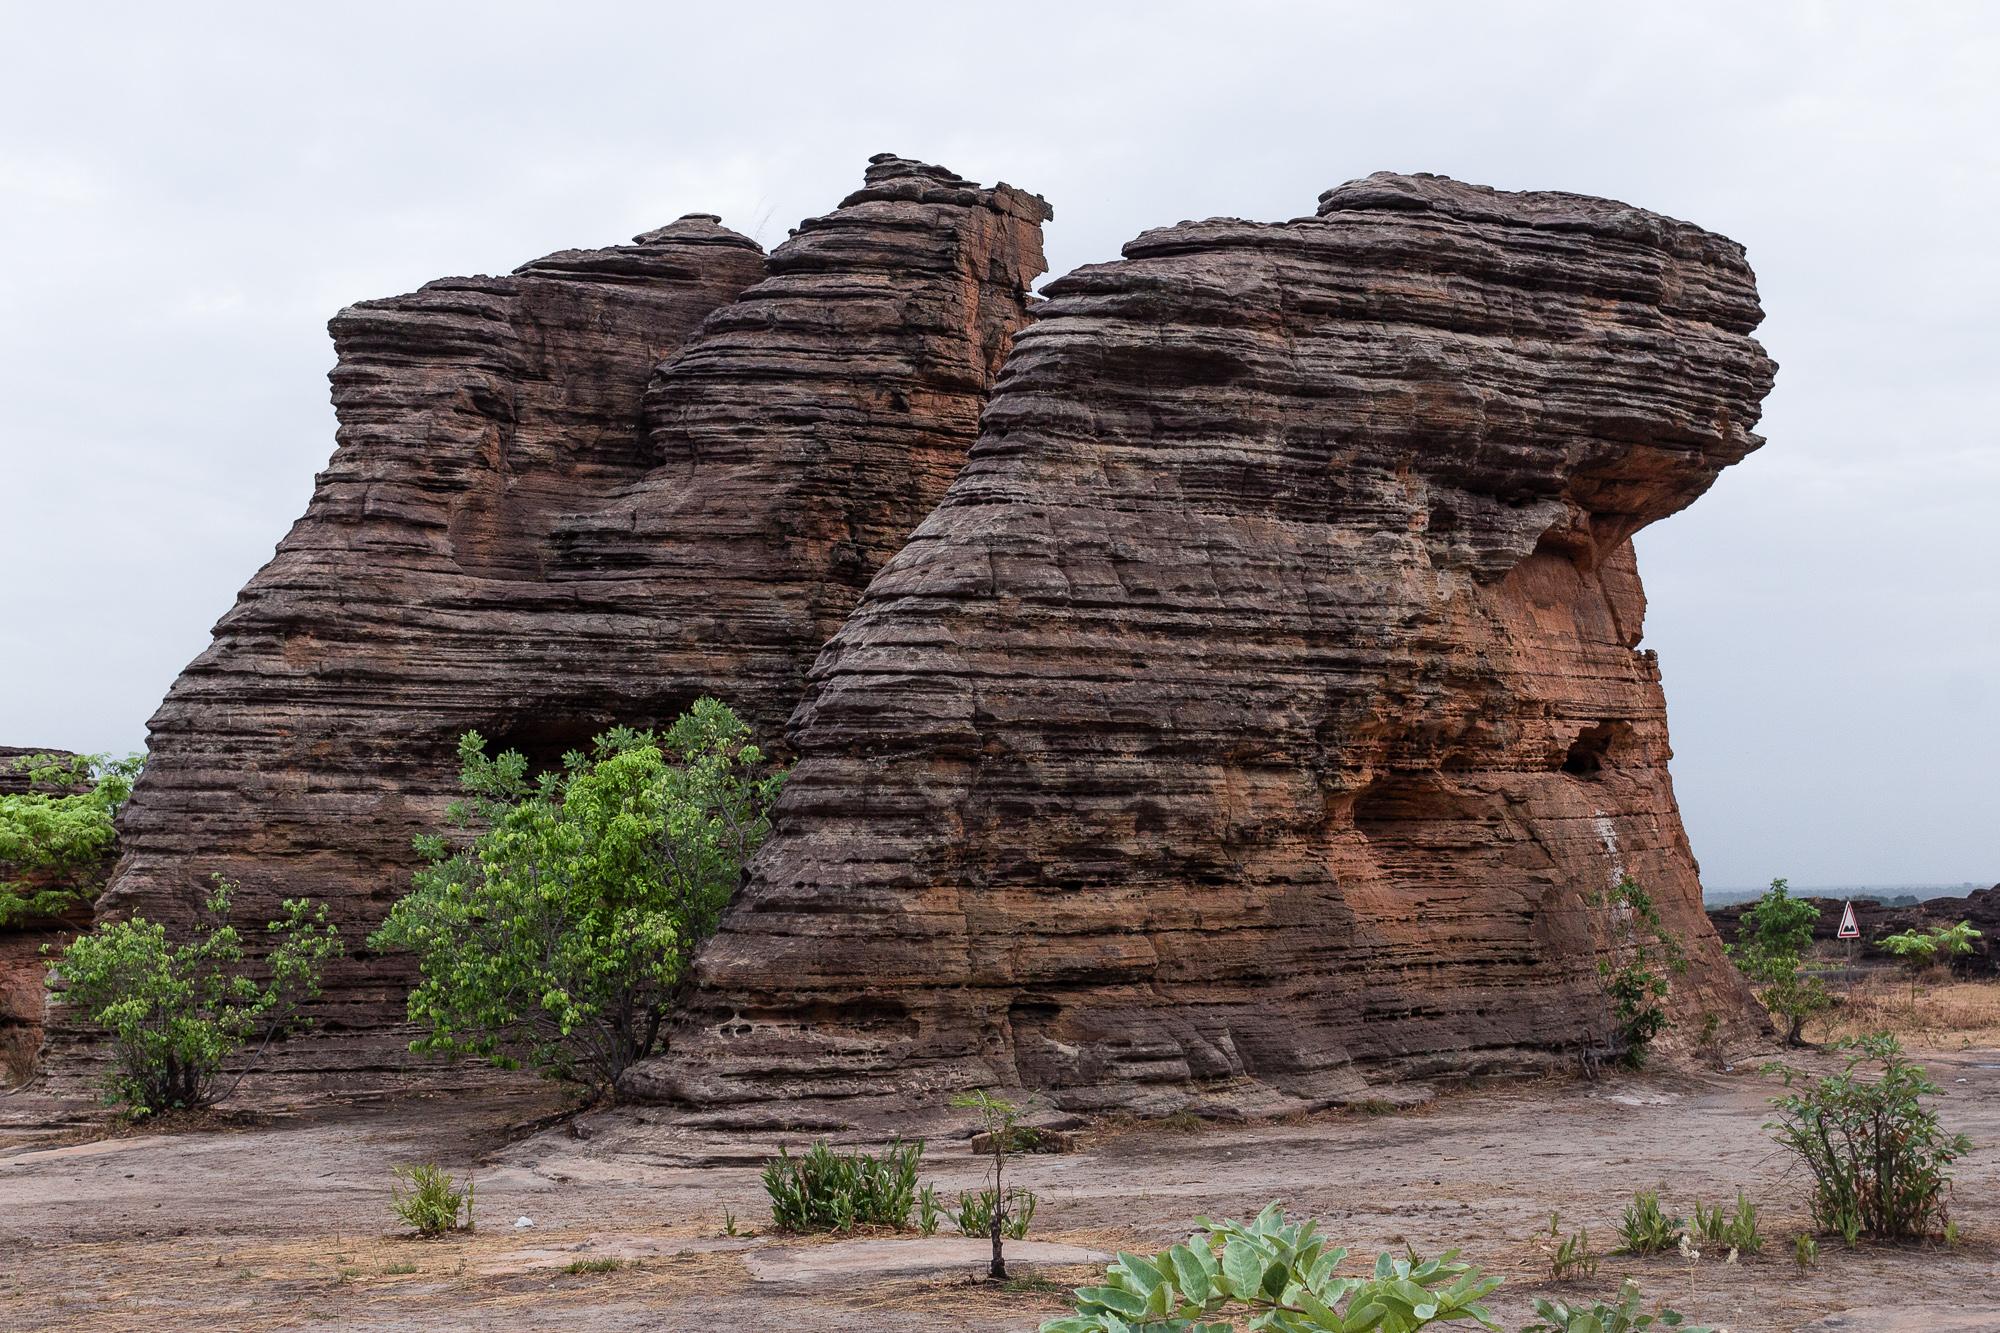 Les strates des dômes de Fabédougou, région de Banfora, Burkina Faso